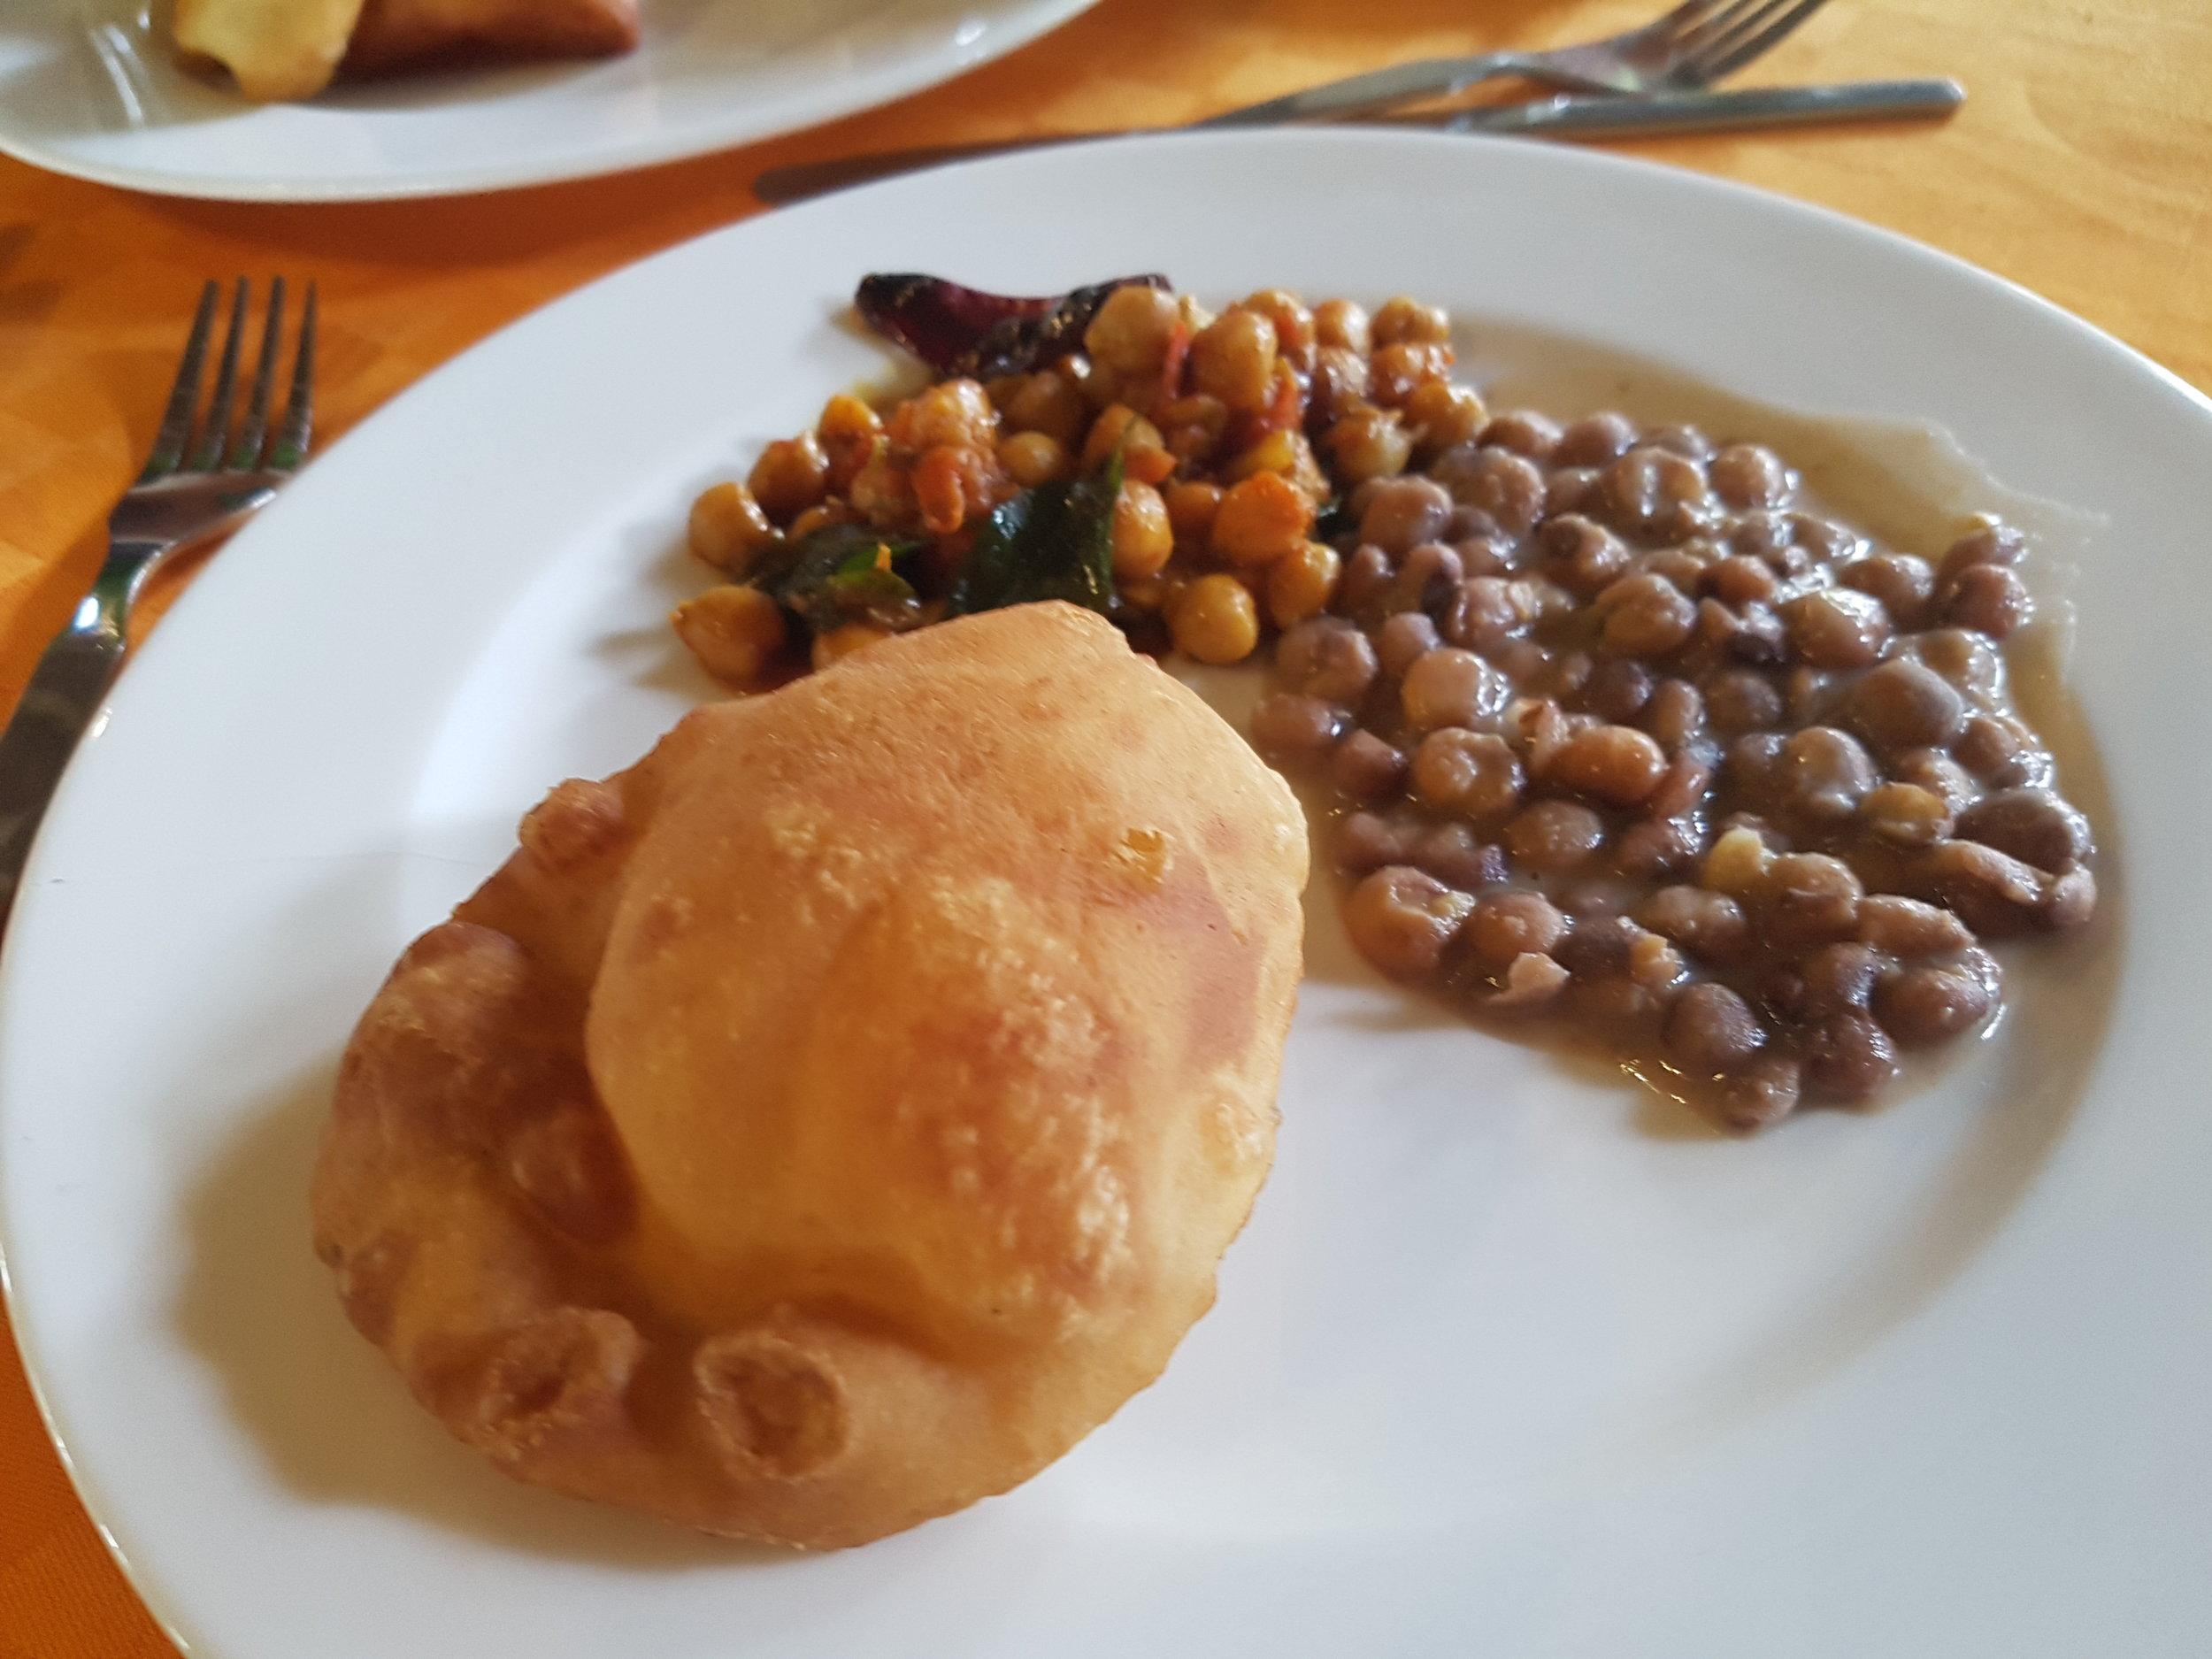 Vegan food at Southern Palms